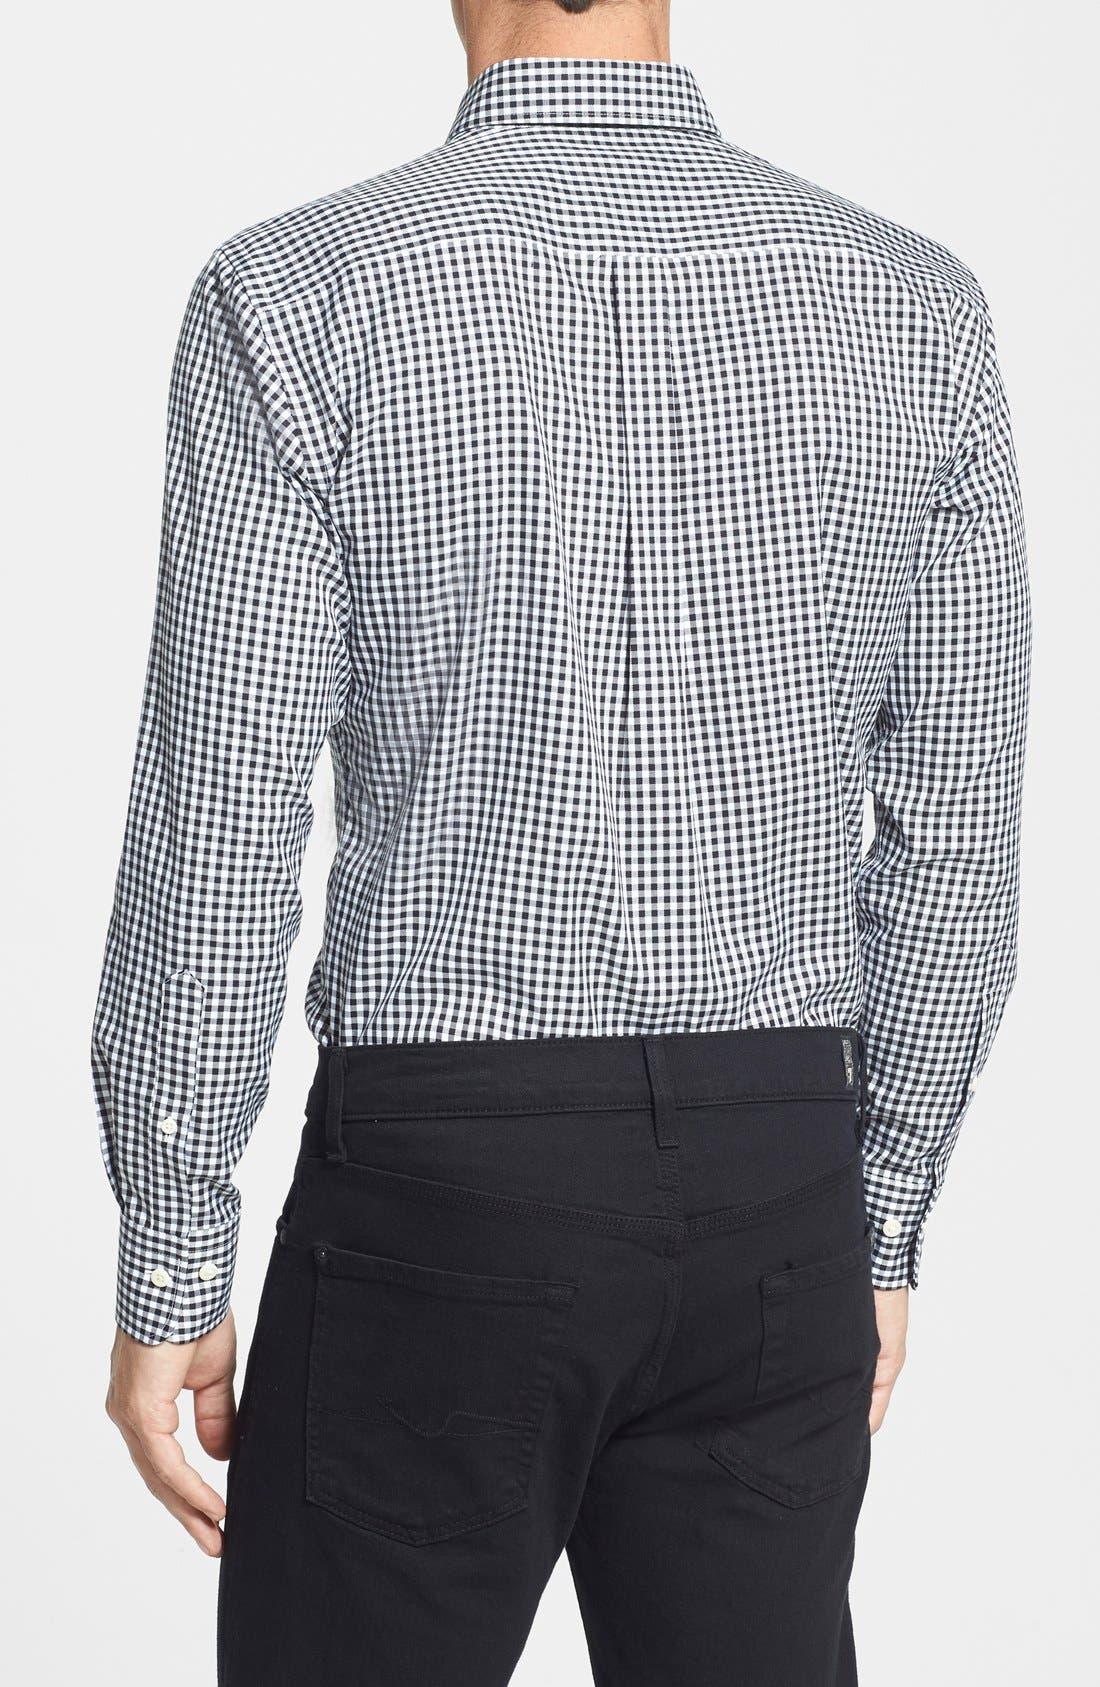 Alternate Image 2  - Peter Millar 'Nanoluxe' Regular Fit Wrinkle Resistant Twill Check Sport Shirt